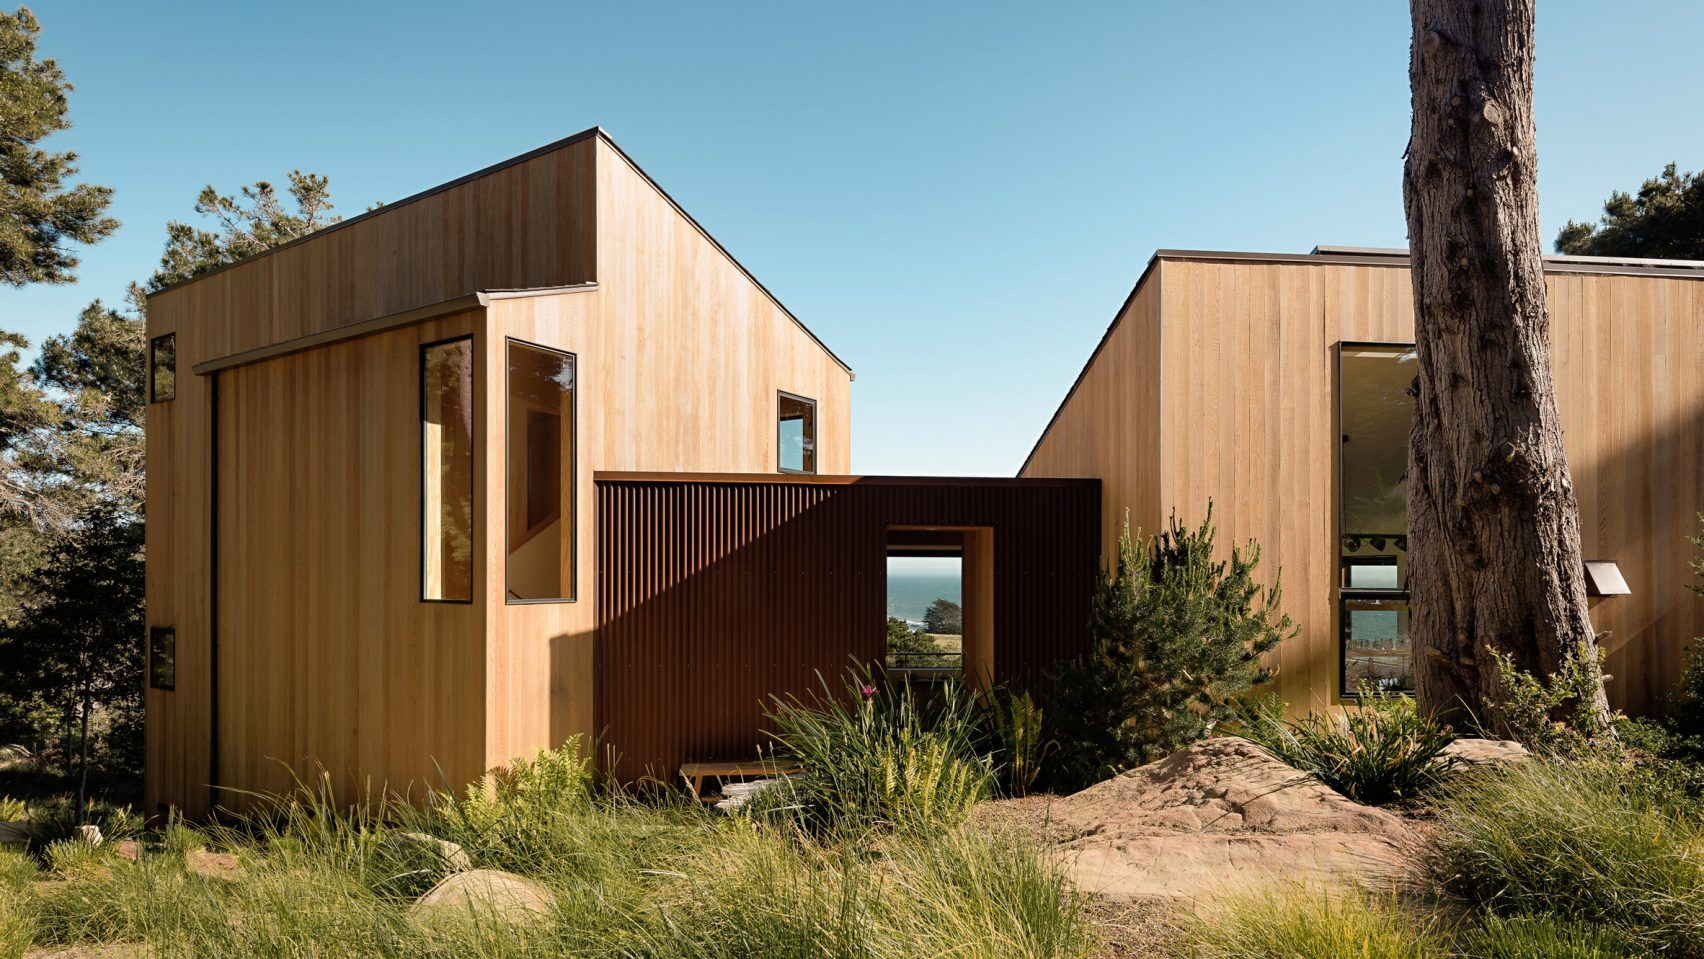 nhà bên biển coastal-retreat-malcolm-davis-architecture-sea-ranch-sonoma-county-califorinia-relaxing-space-elledecoration vn 2